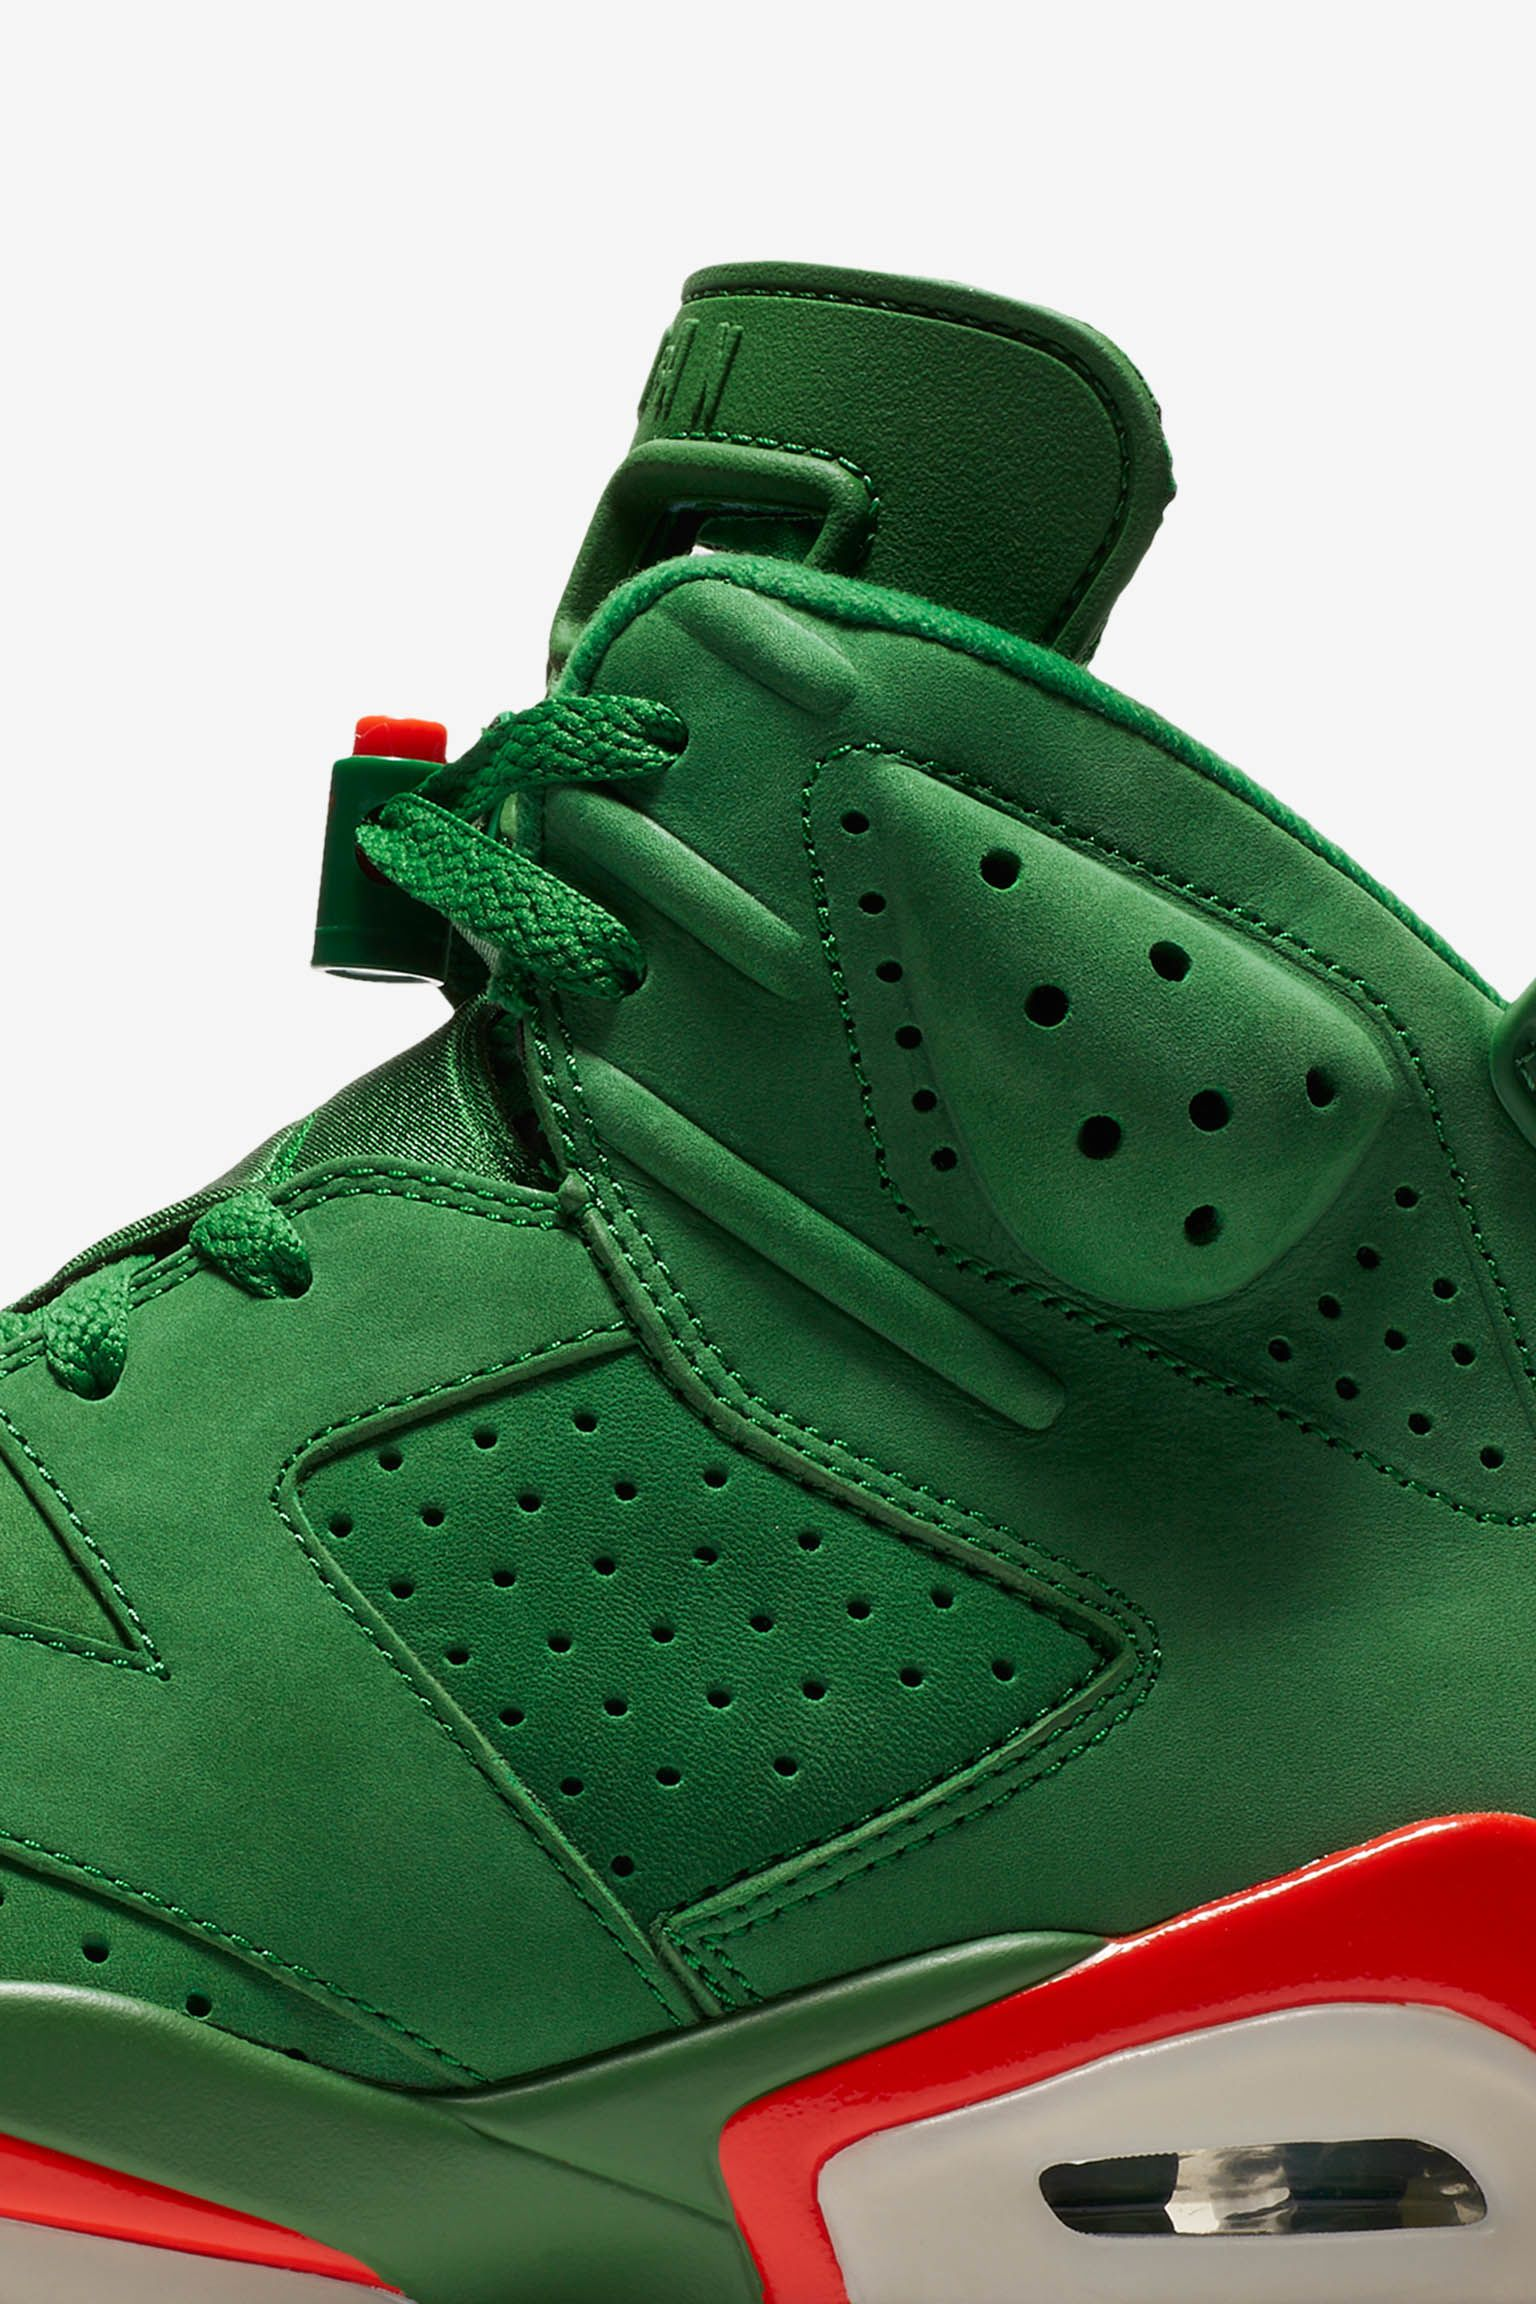 1dfb45fb8d1 Air Jordan 6 Gatorade 'Pine Green' Release Date. Nike+ SNKRS